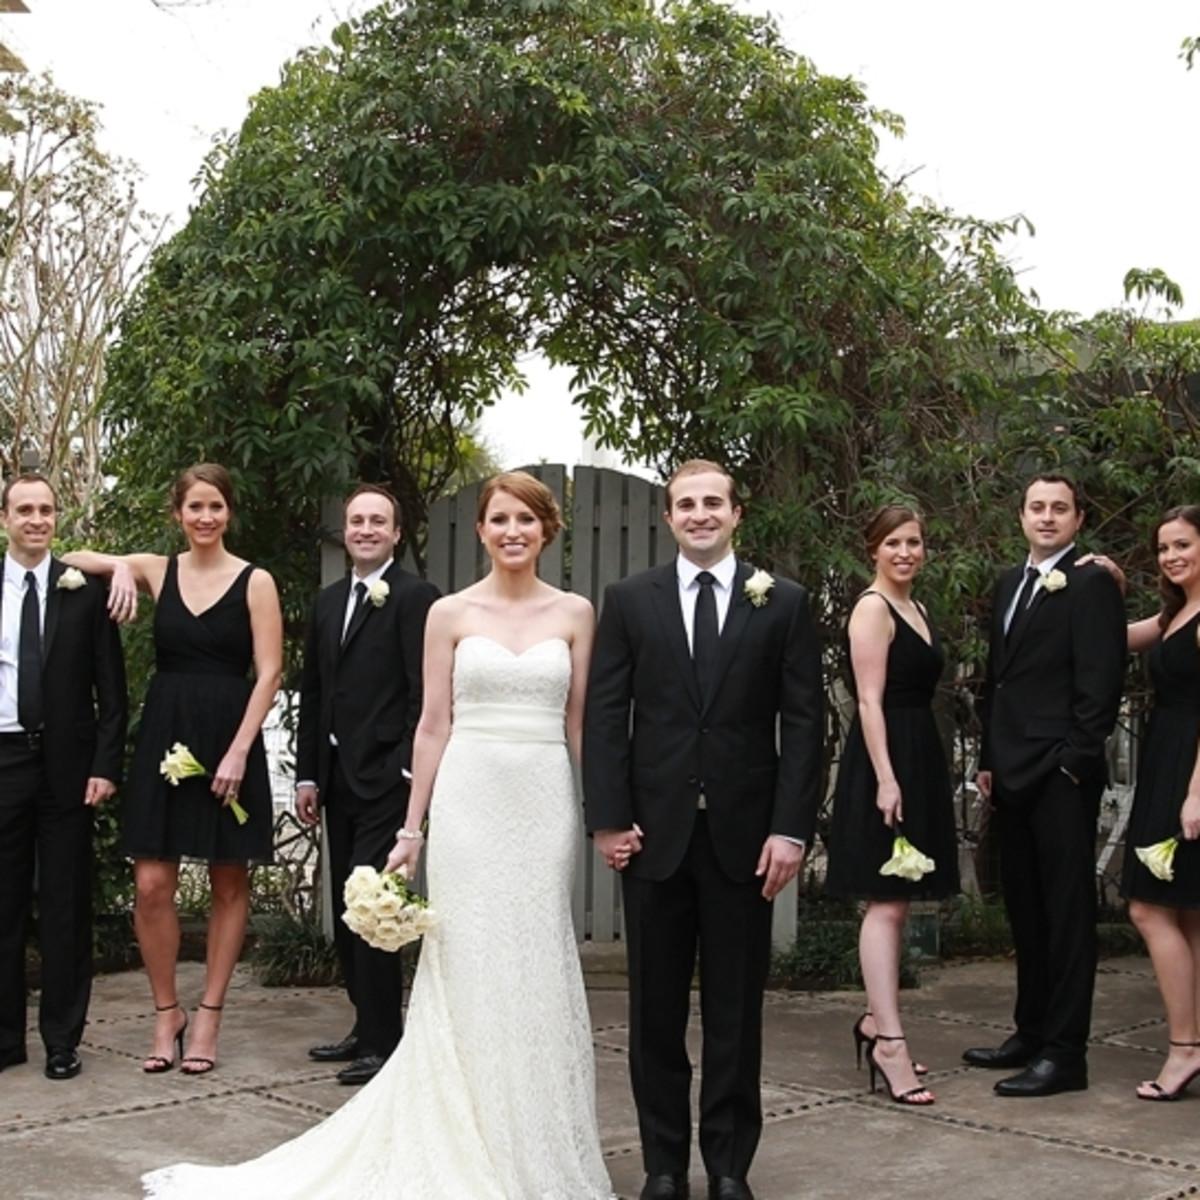 Wedding party outdoor